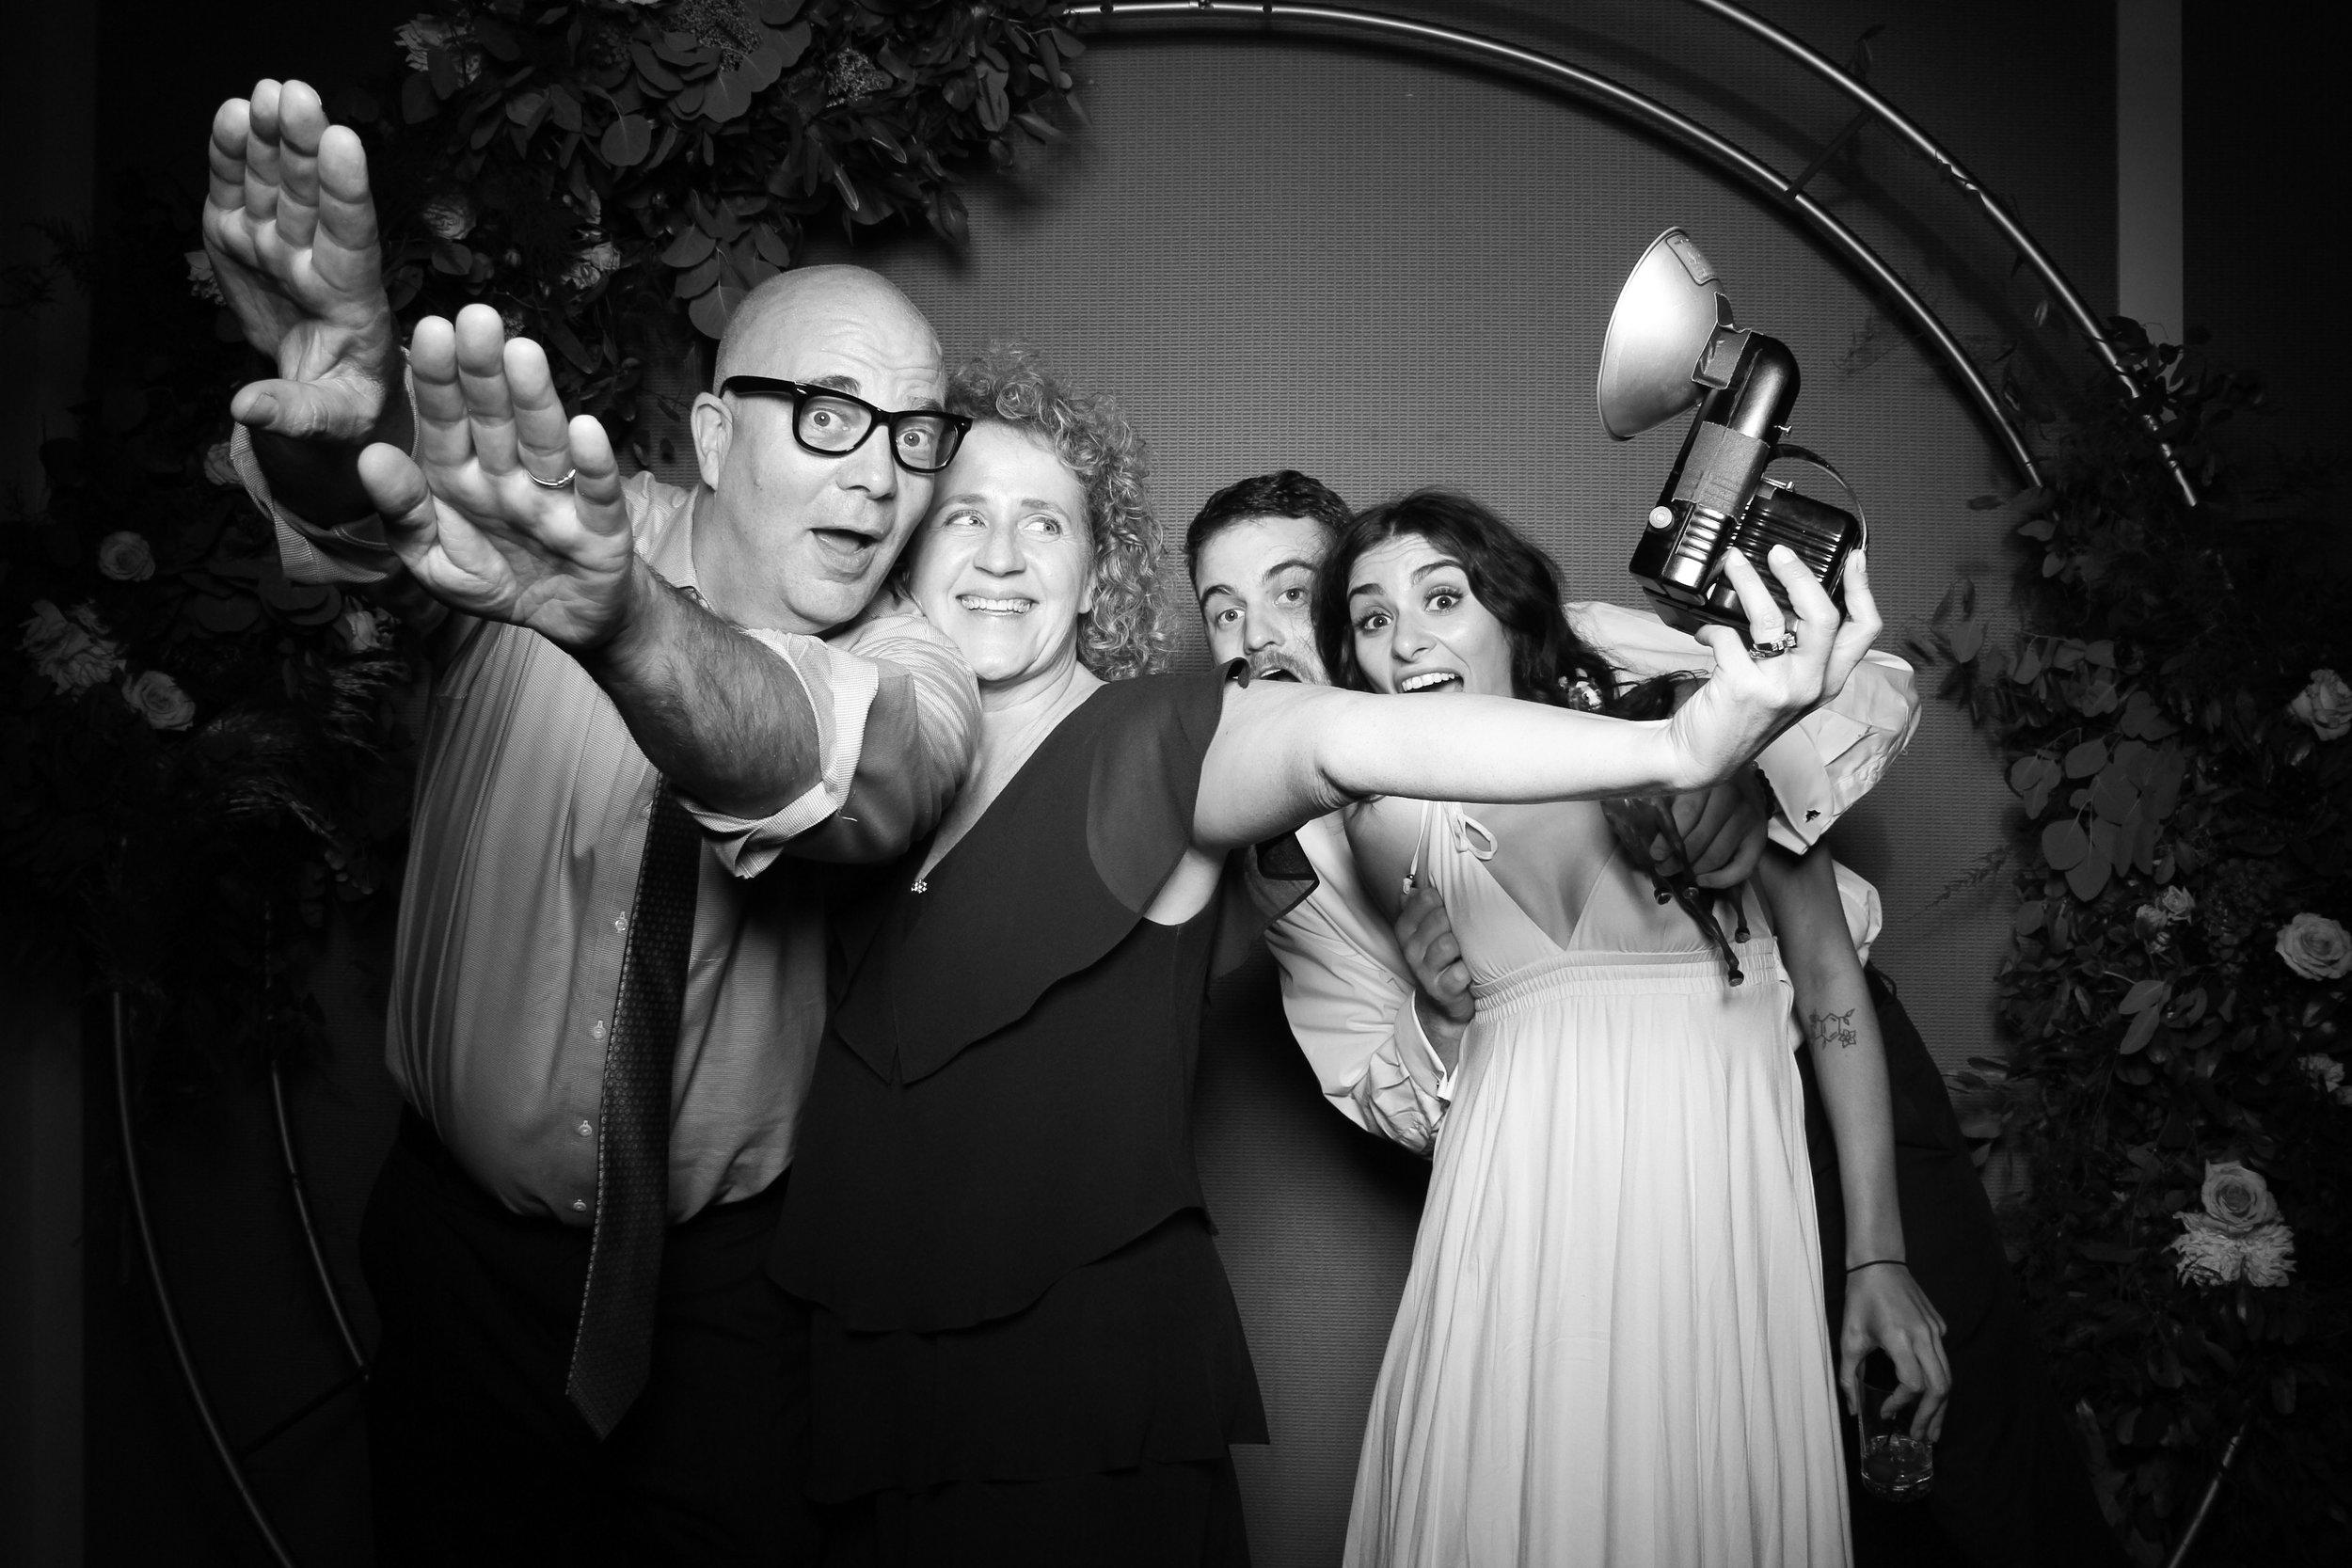 Metropolis_Ballroom_Wedding_Arlington_Heights_Photo_Booth_20.jpg